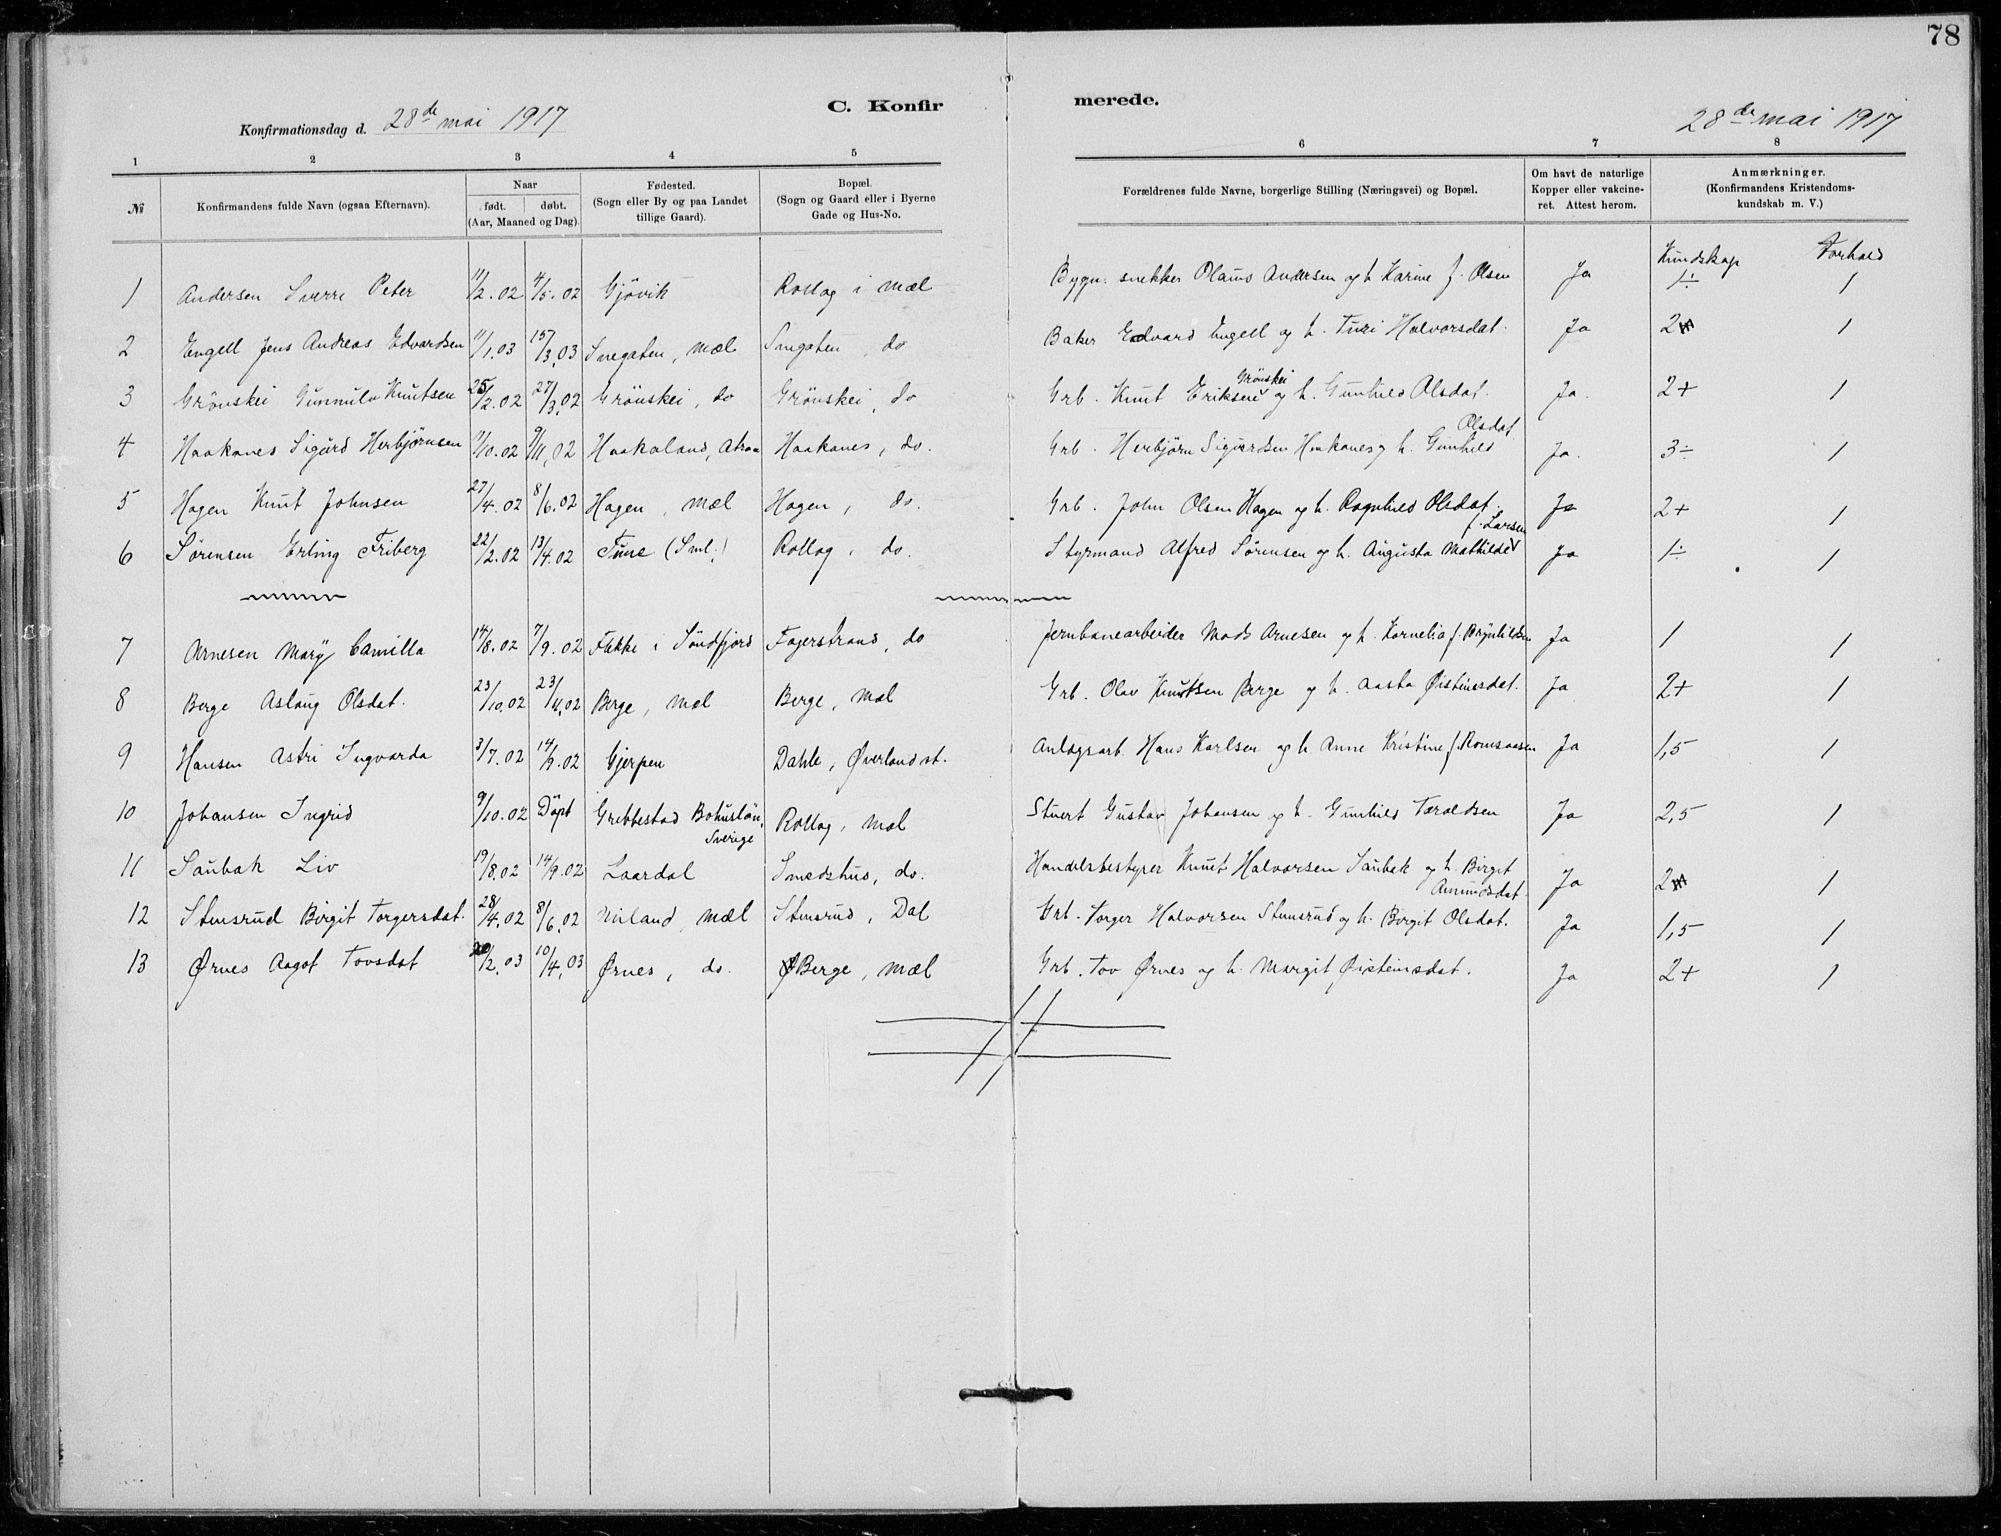 SAKO, Tinn kirkebøker, F/Fb/L0002: Ministerialbok nr. II 2, 1878-1917, s. 78